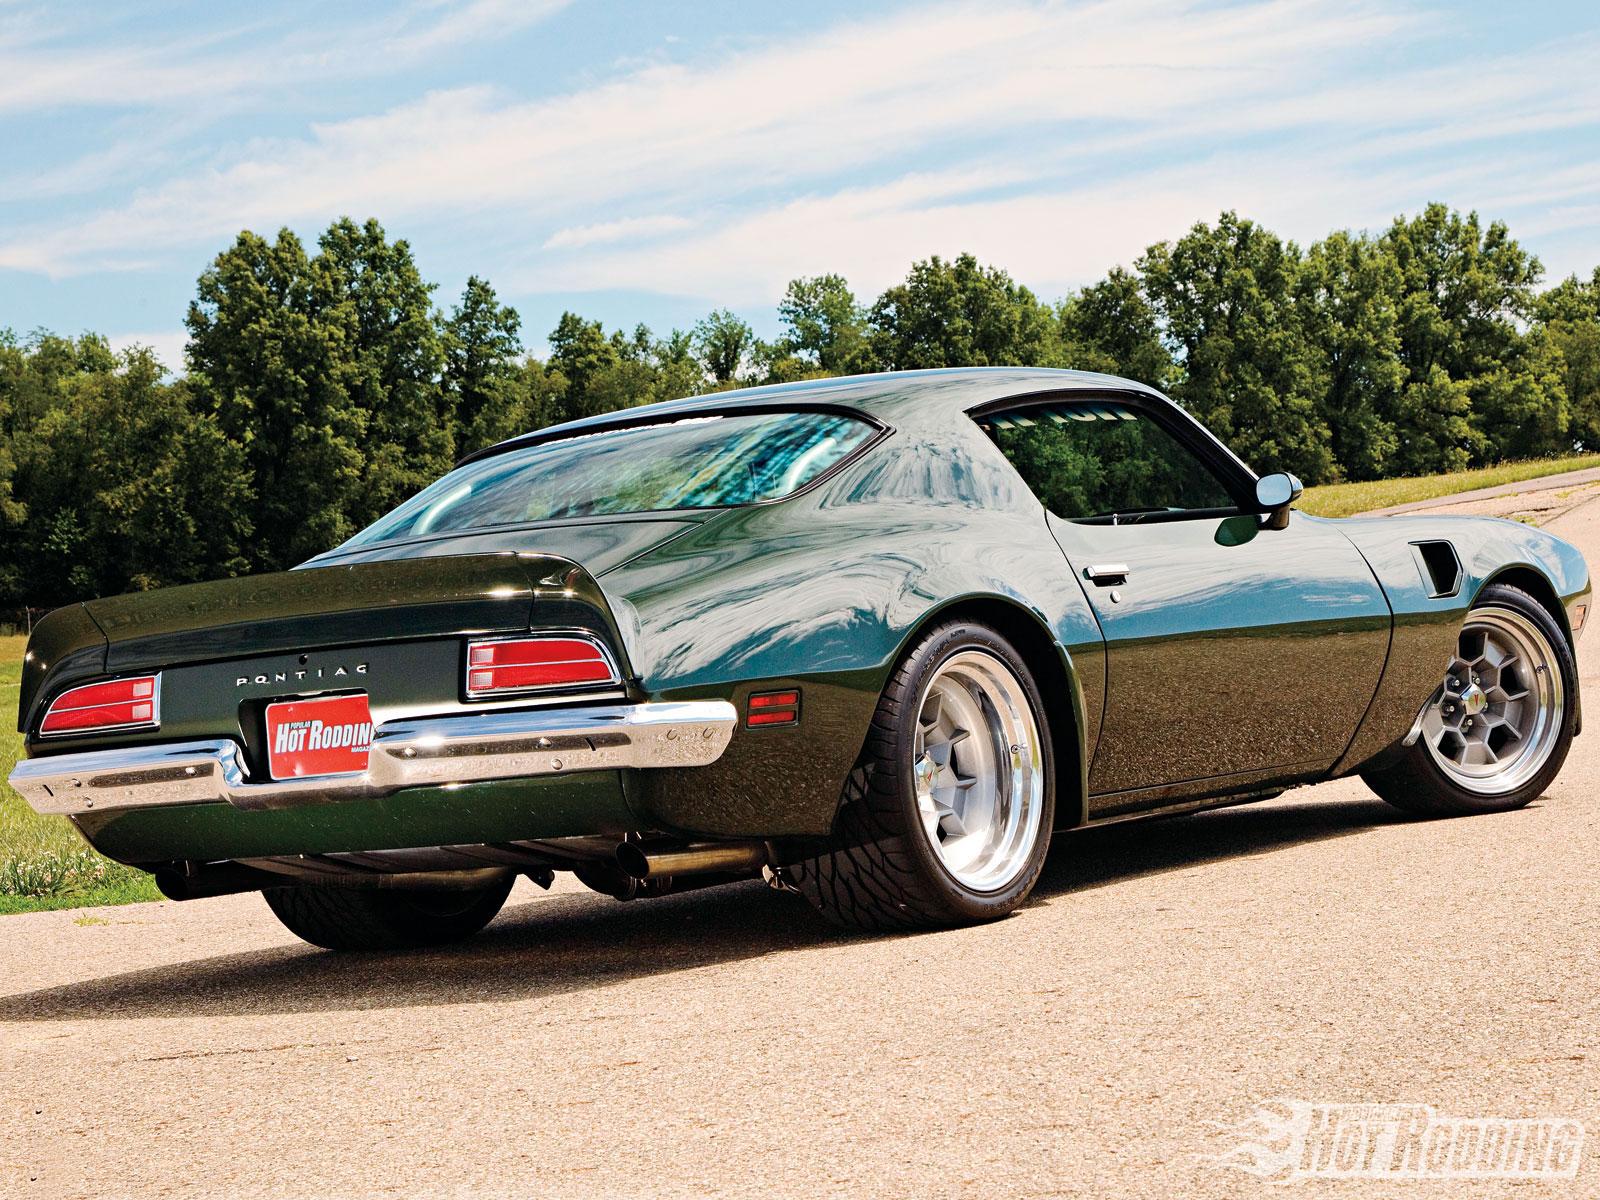 Pontiac Trans Am Hot Rods Muscle Cars Wallpaper